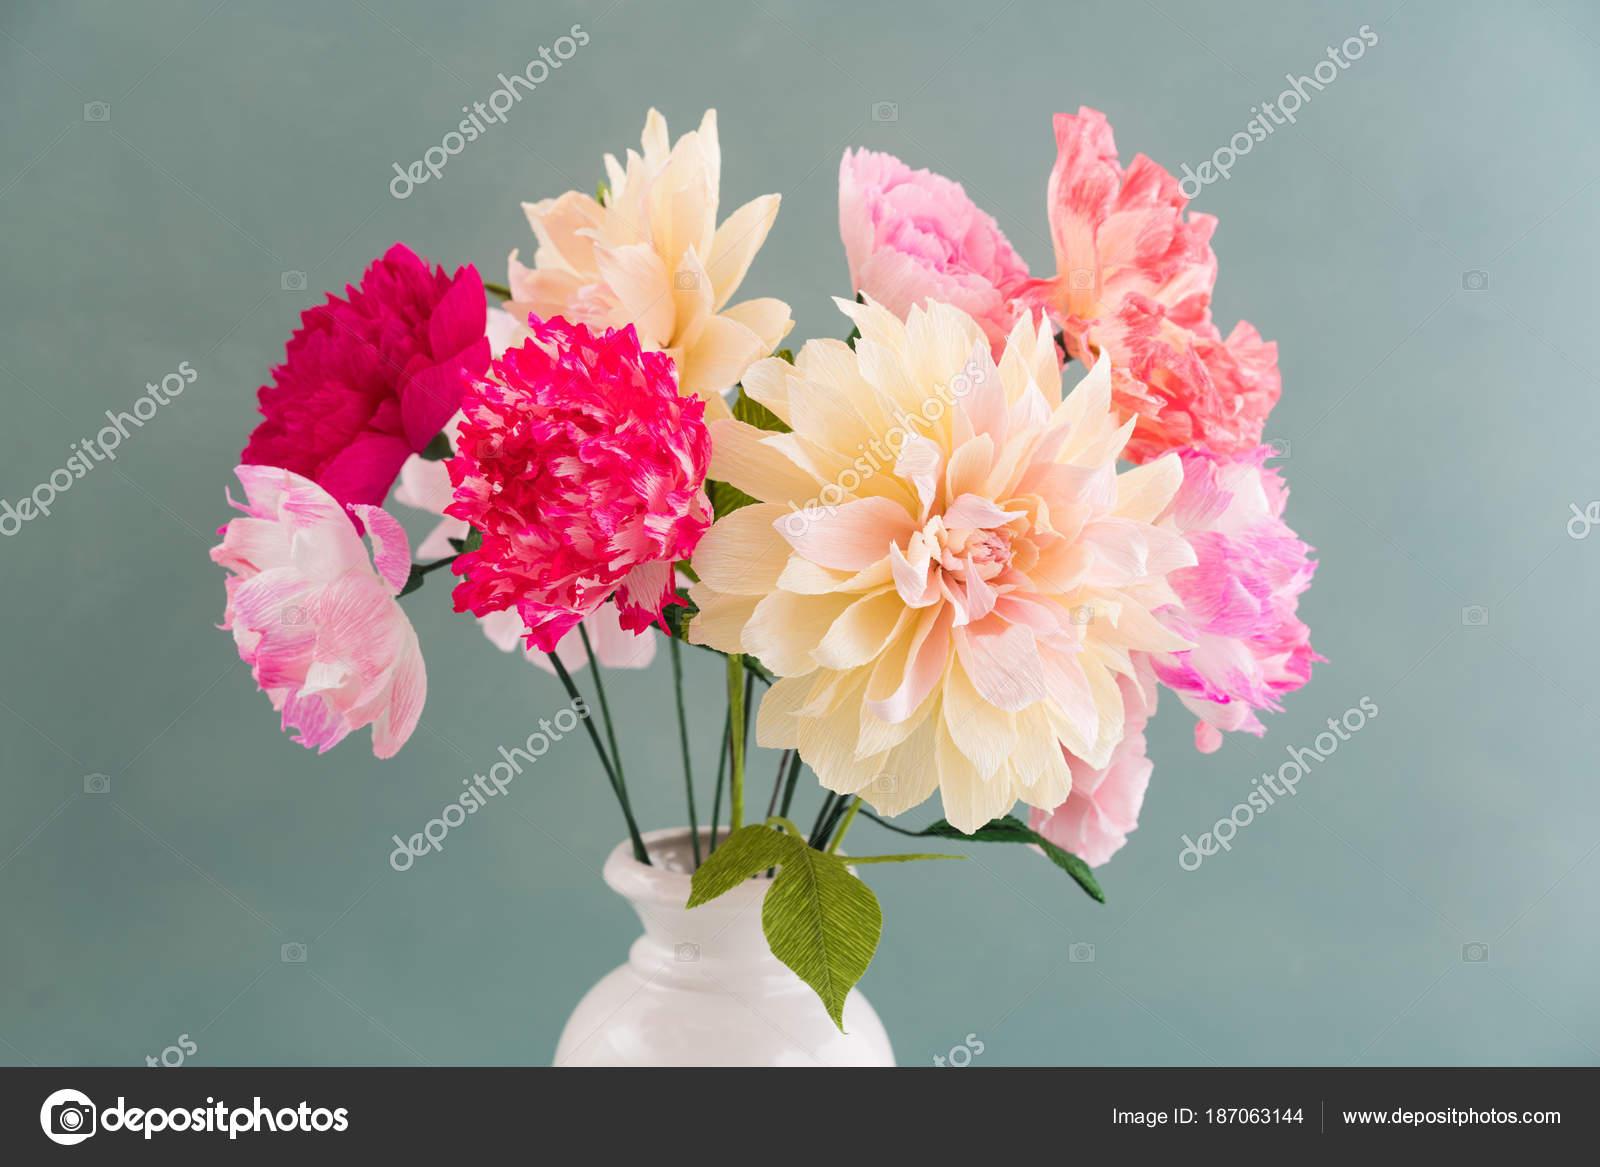 Crepe Paper Flower Bouquet Stock Photo Ecoelfen 187063144